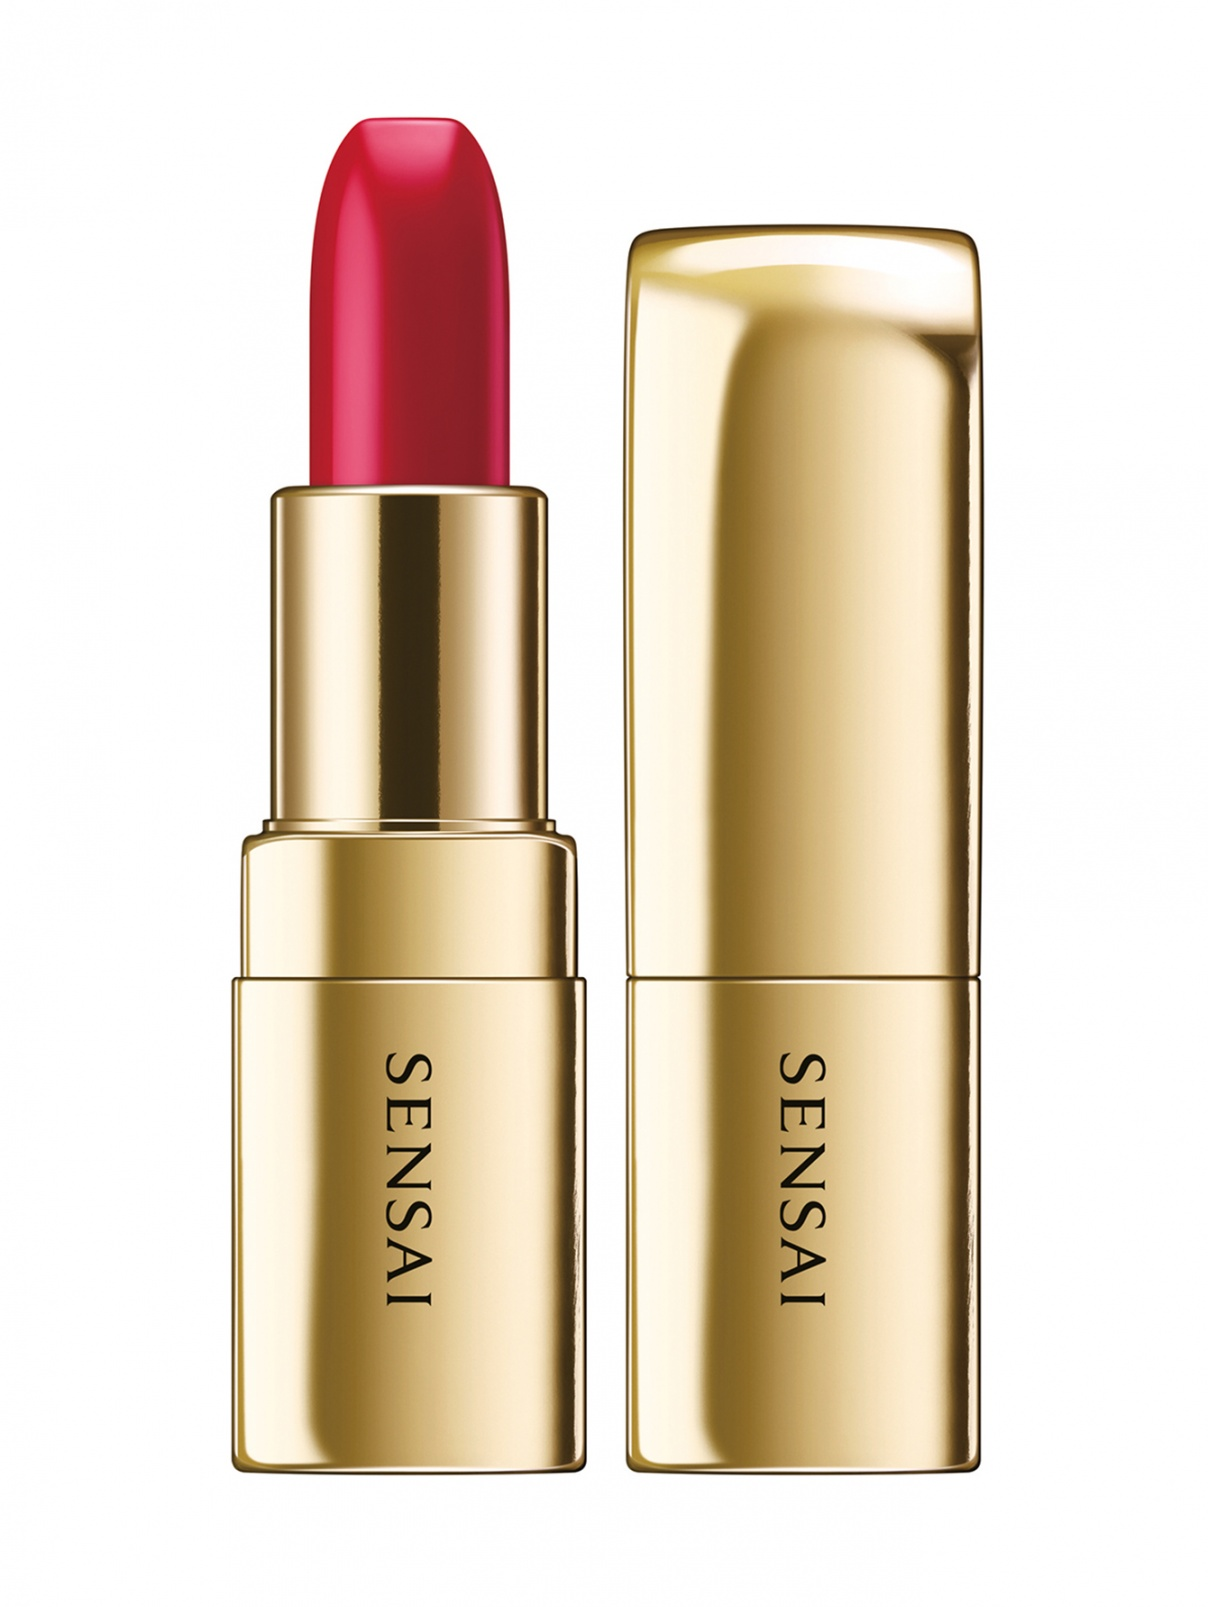 Помада The Lipstick оттенок - 01 SAKURA RED Makeup Sensai  –  Общий вид